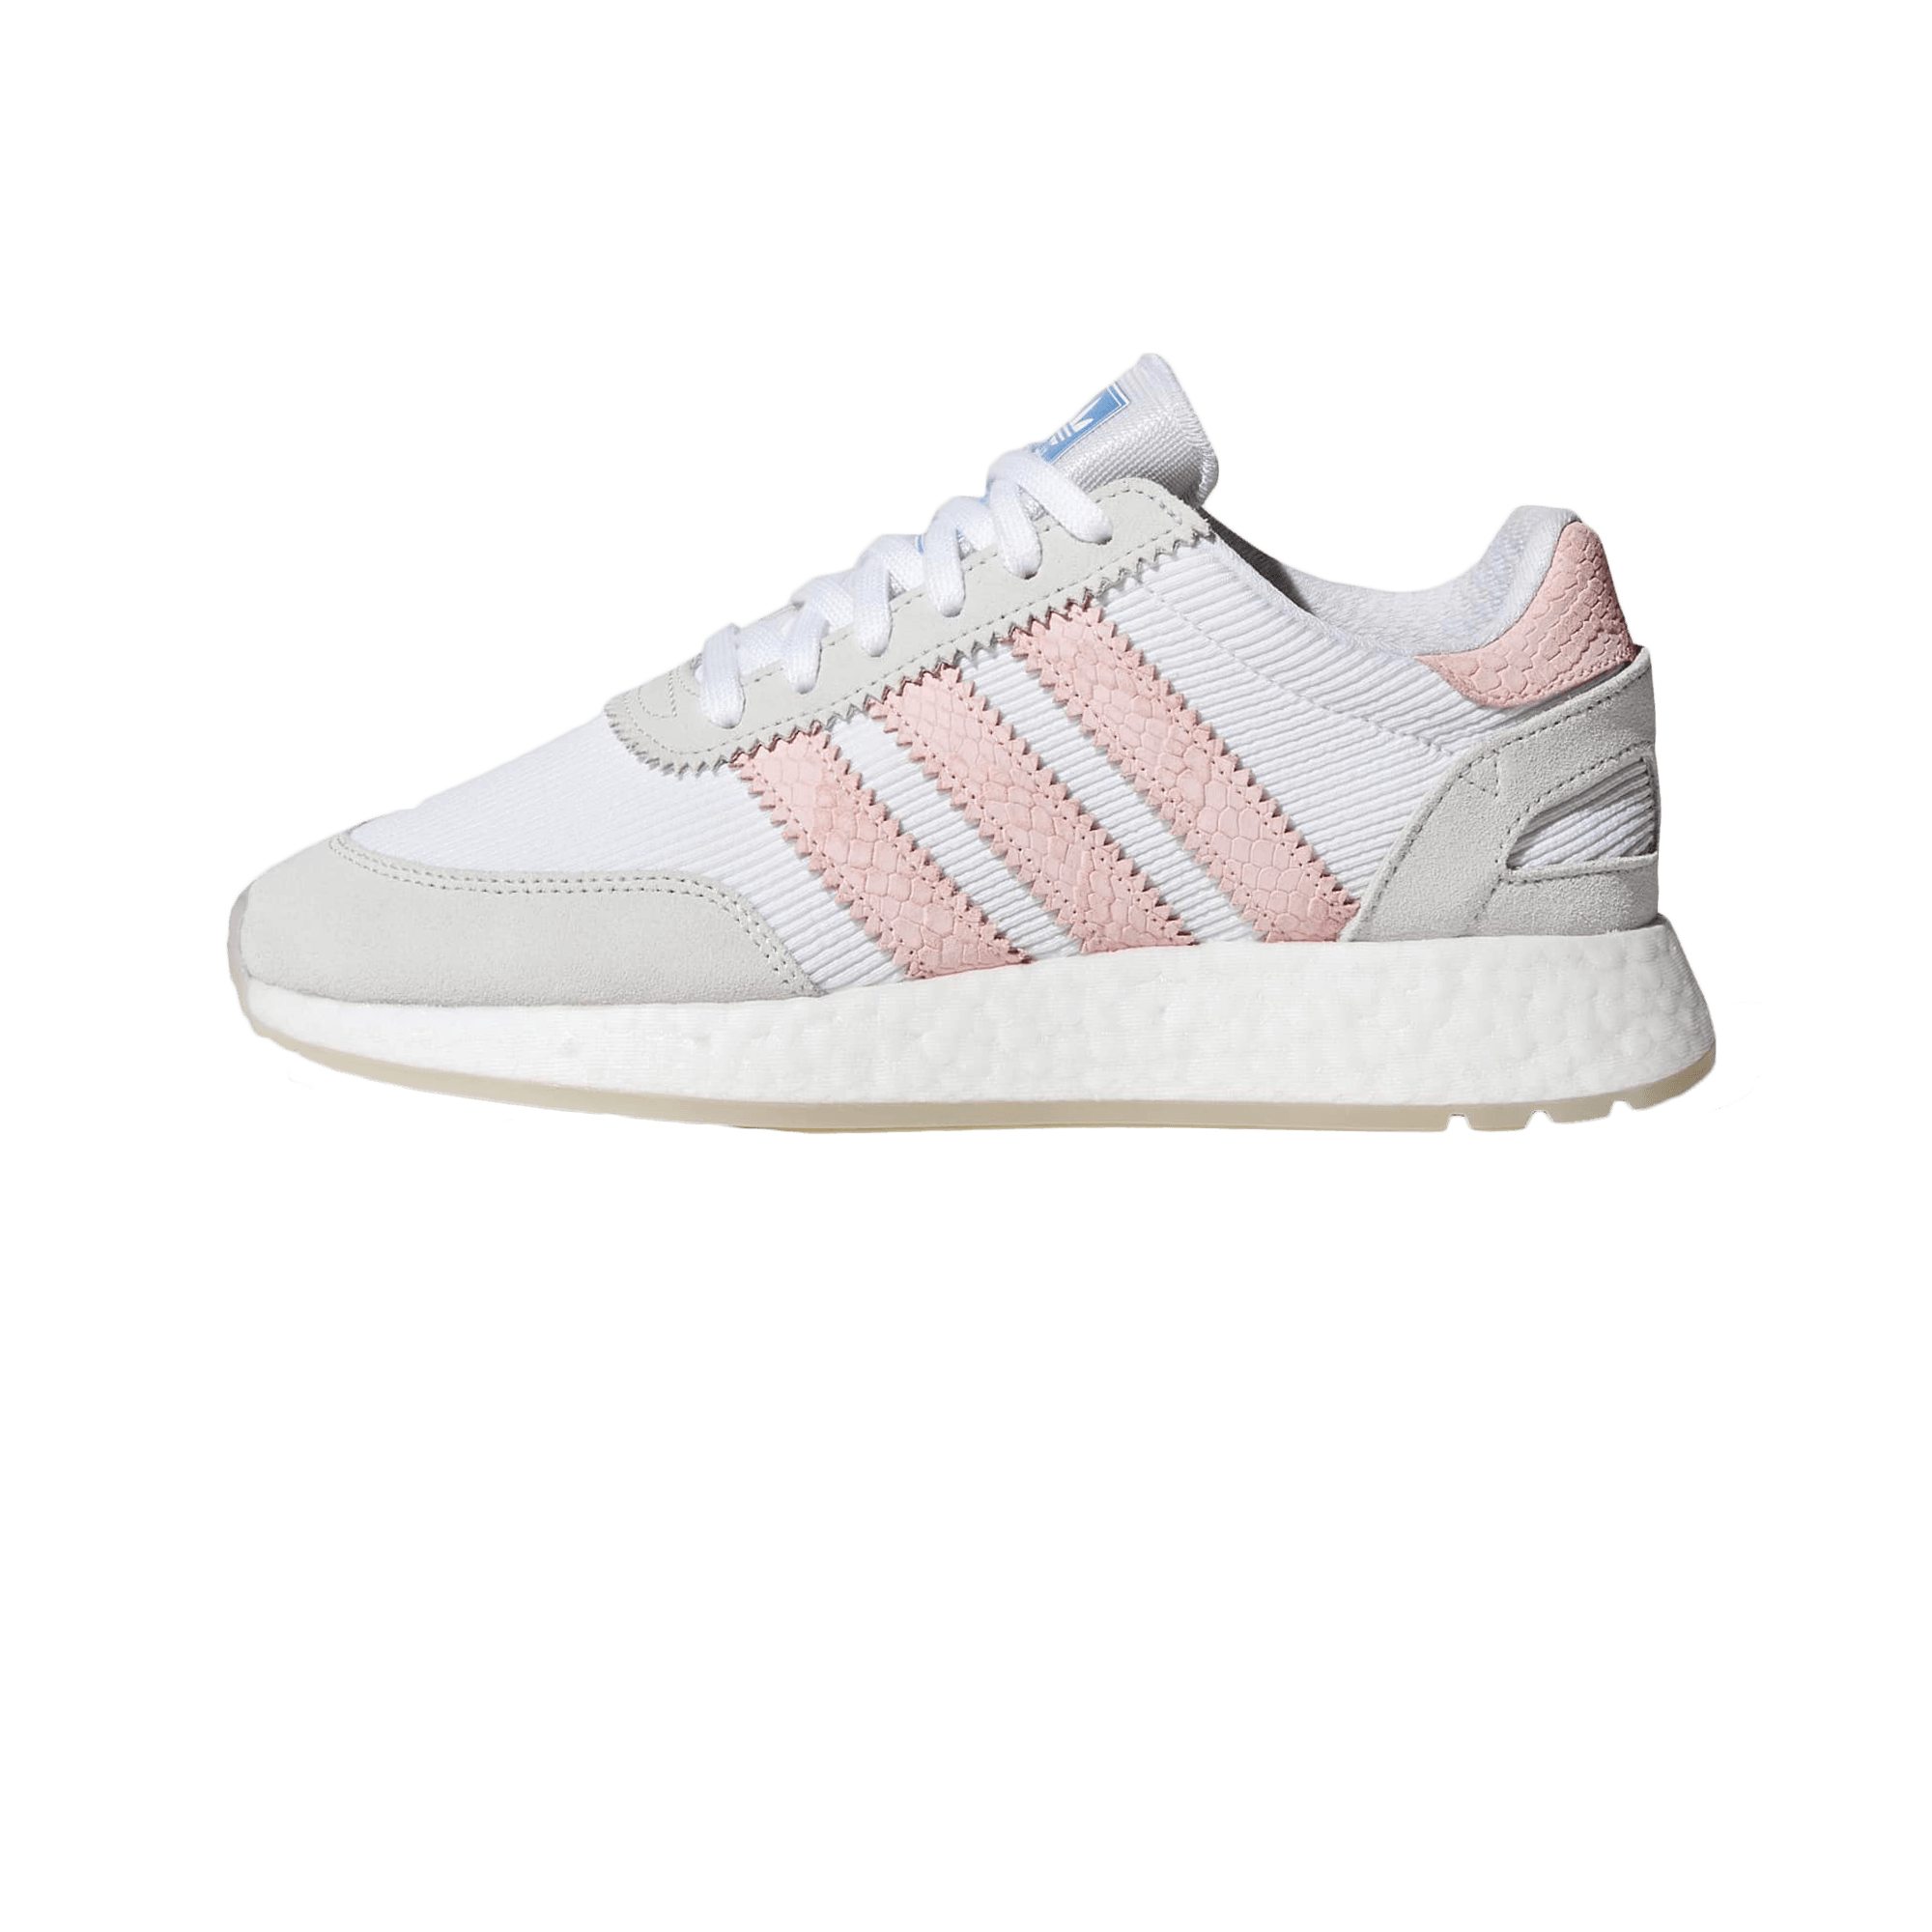 White 5923 W Adidas Ice Pink Footwear Woman Crystal I xoWeQCrdB